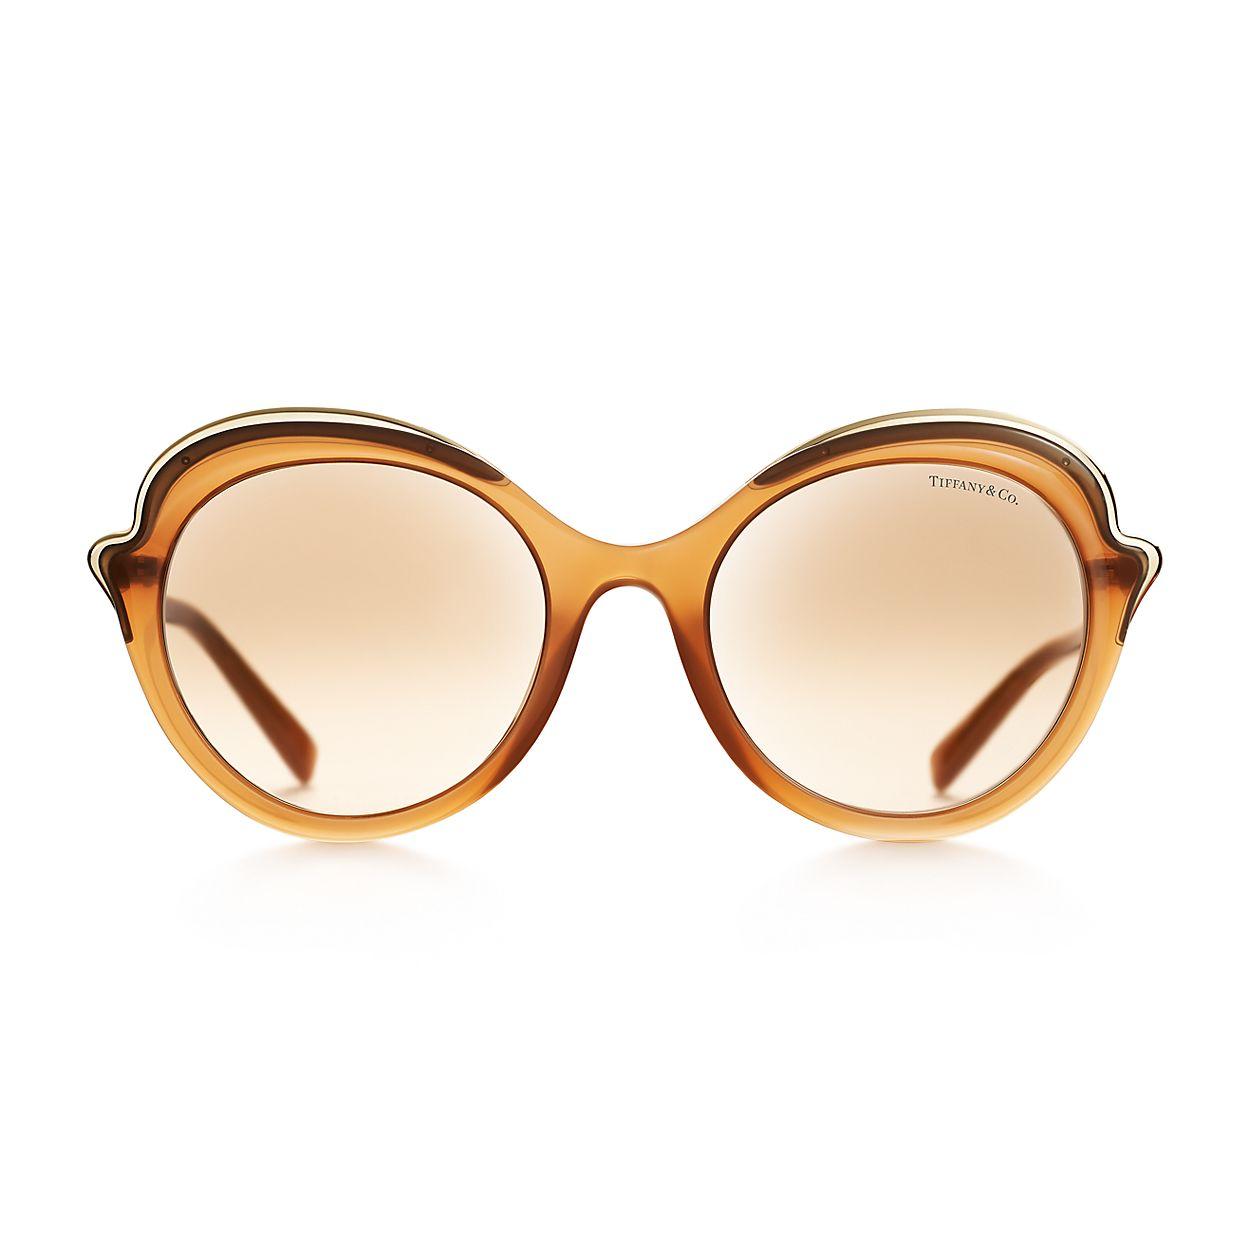 490784c992373 Tiffany Paper Flowers cat eye sunglasses in camel acetate.